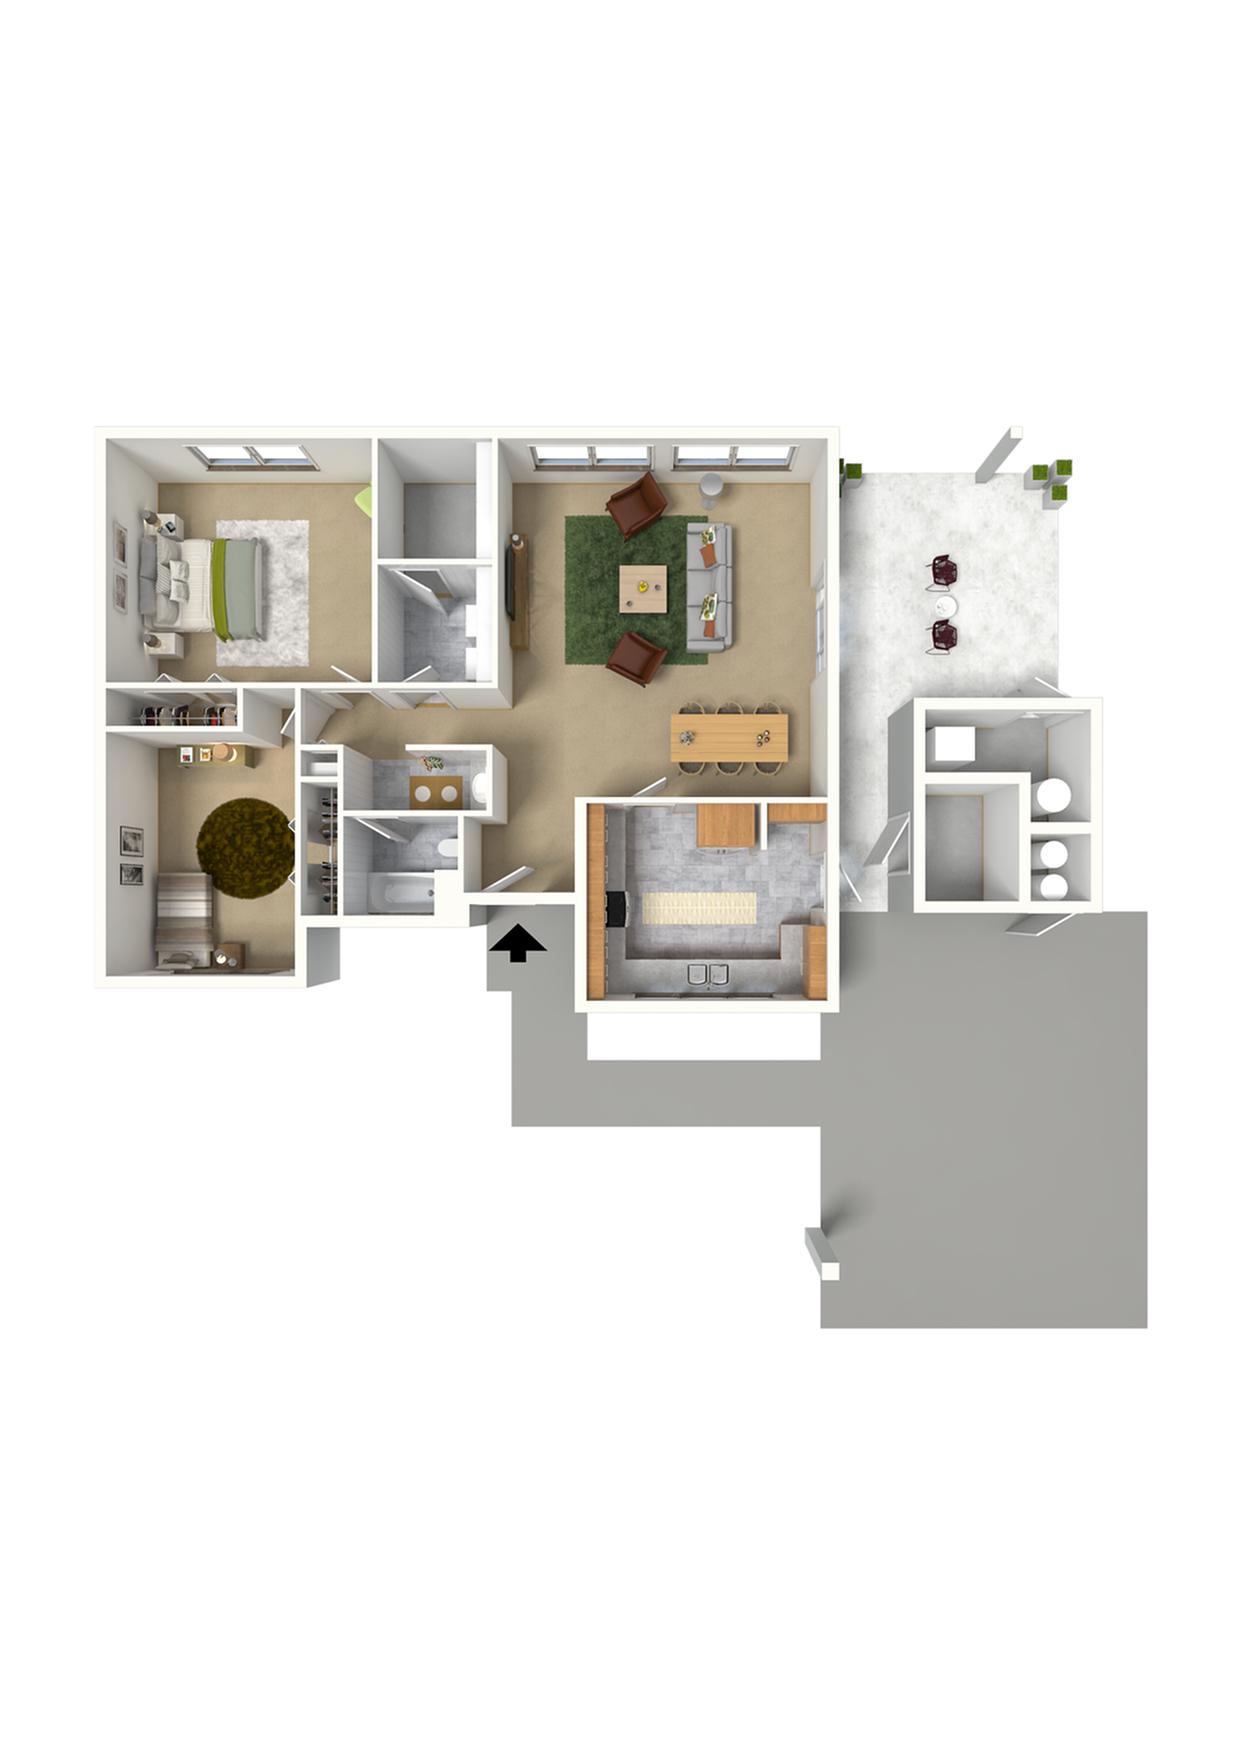 2 Bedroom Duplex Floor Plan | Hickam Air Force Base Housing | Hickam Communities